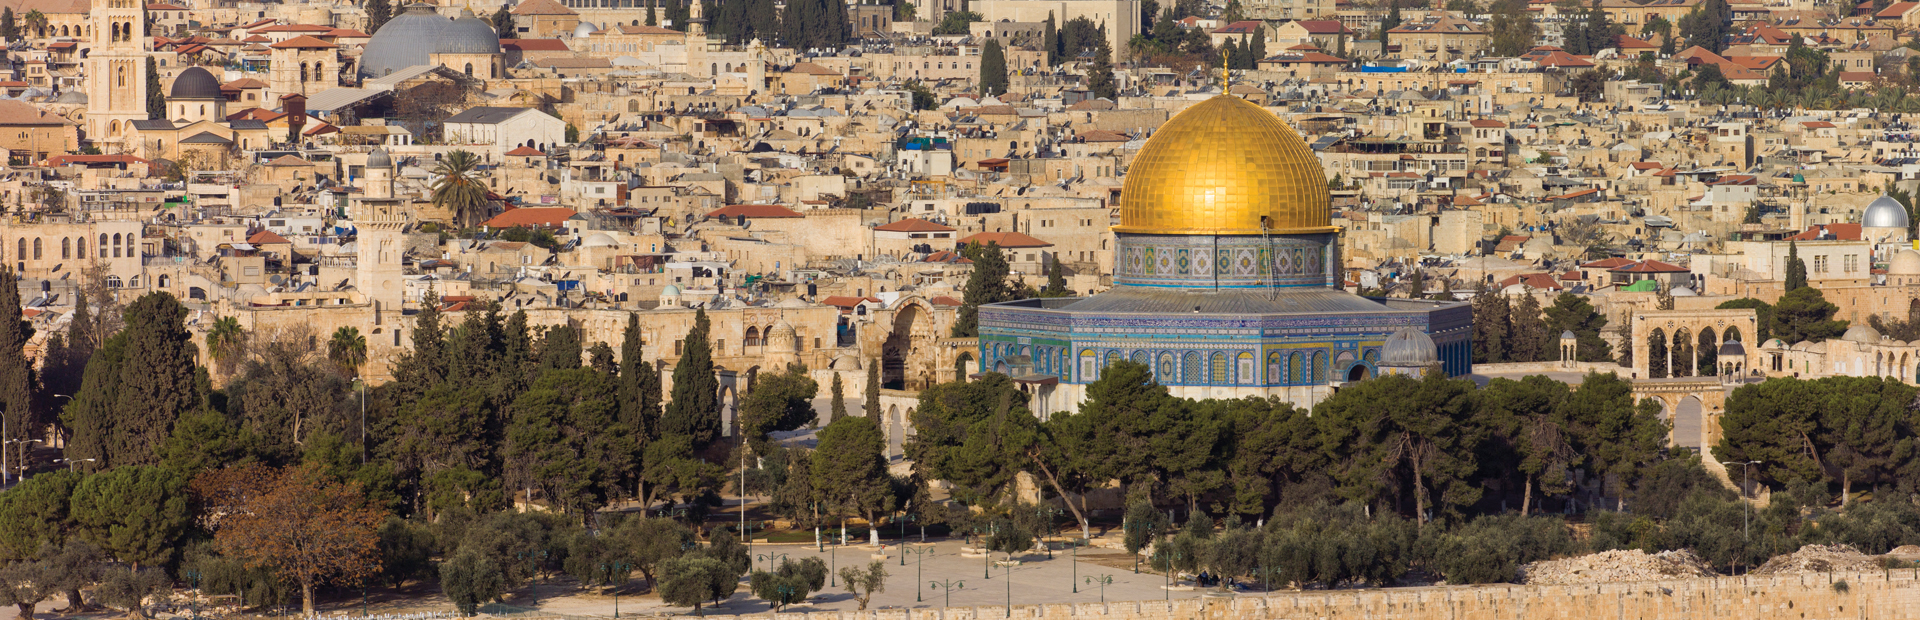 ISRAEL_Tour_1920x620